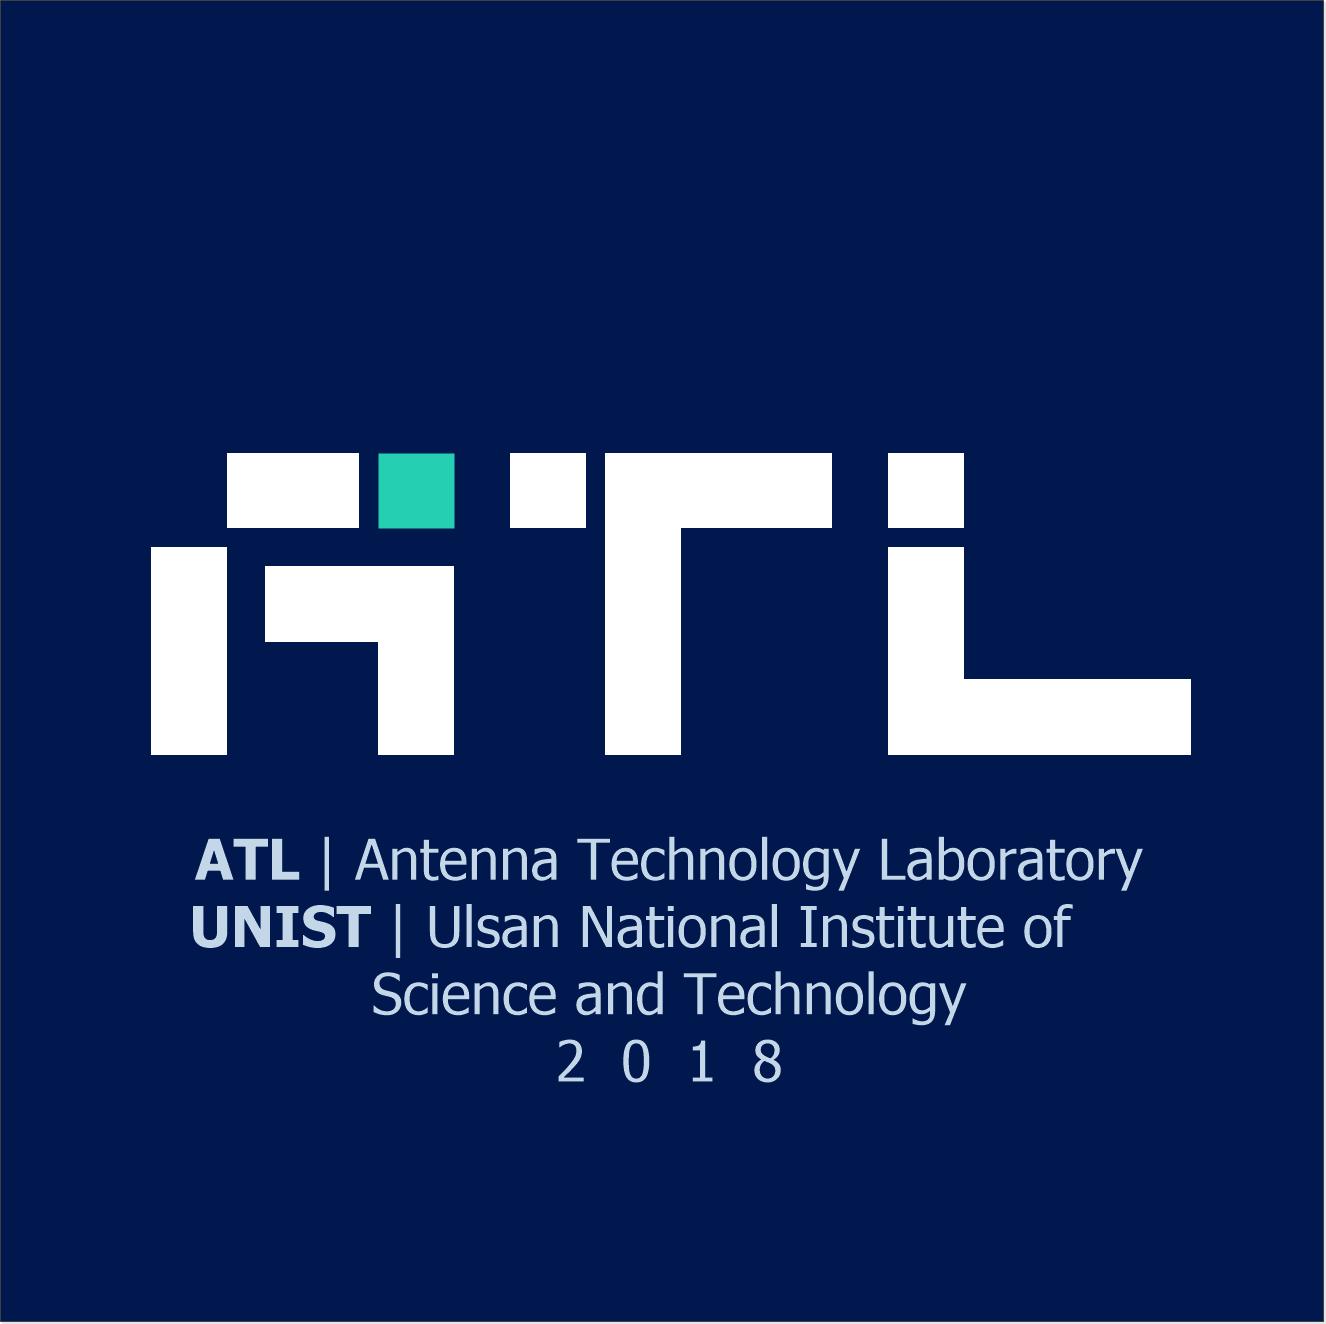 ATL Antenna Technology Laboratory